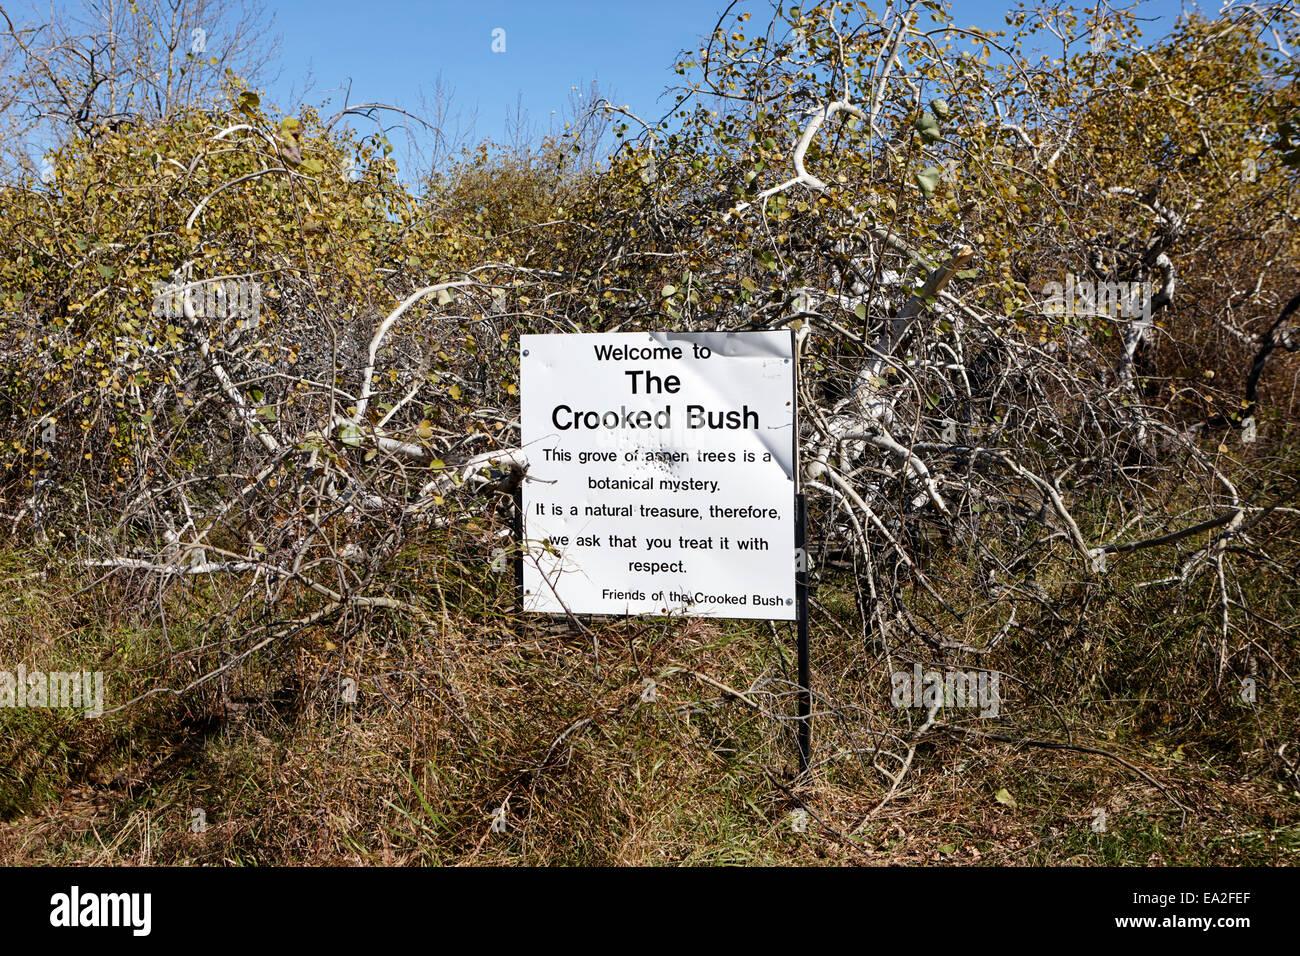 the crooked bush group of twisted aspen trees Saskatchewan Canada - Stock Image